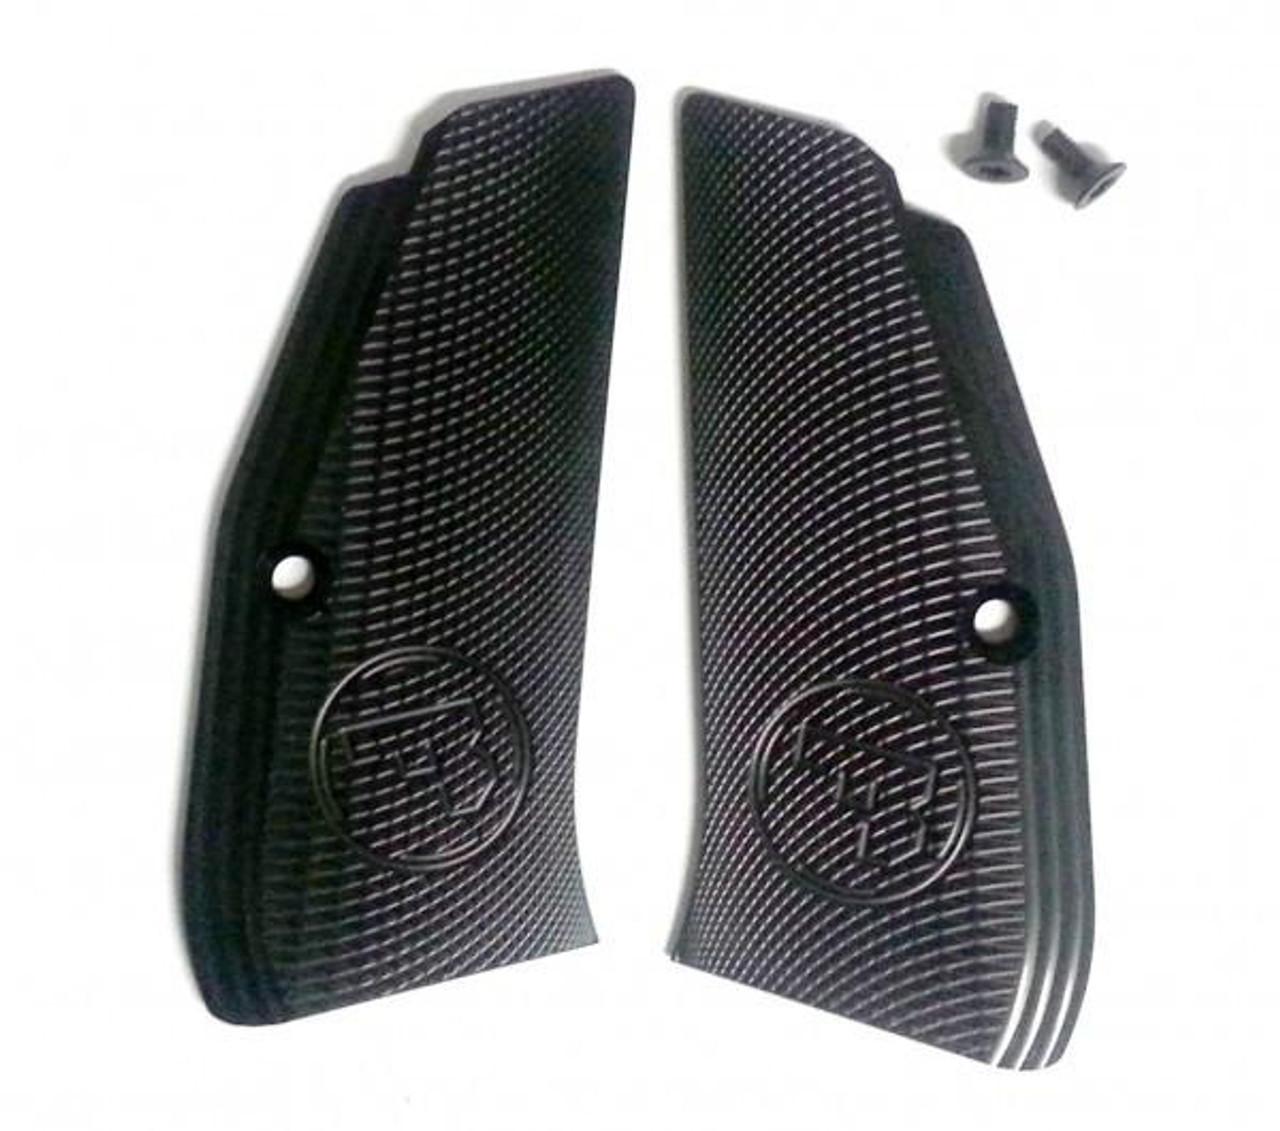 CZ 97B aluminum black checker grips factory